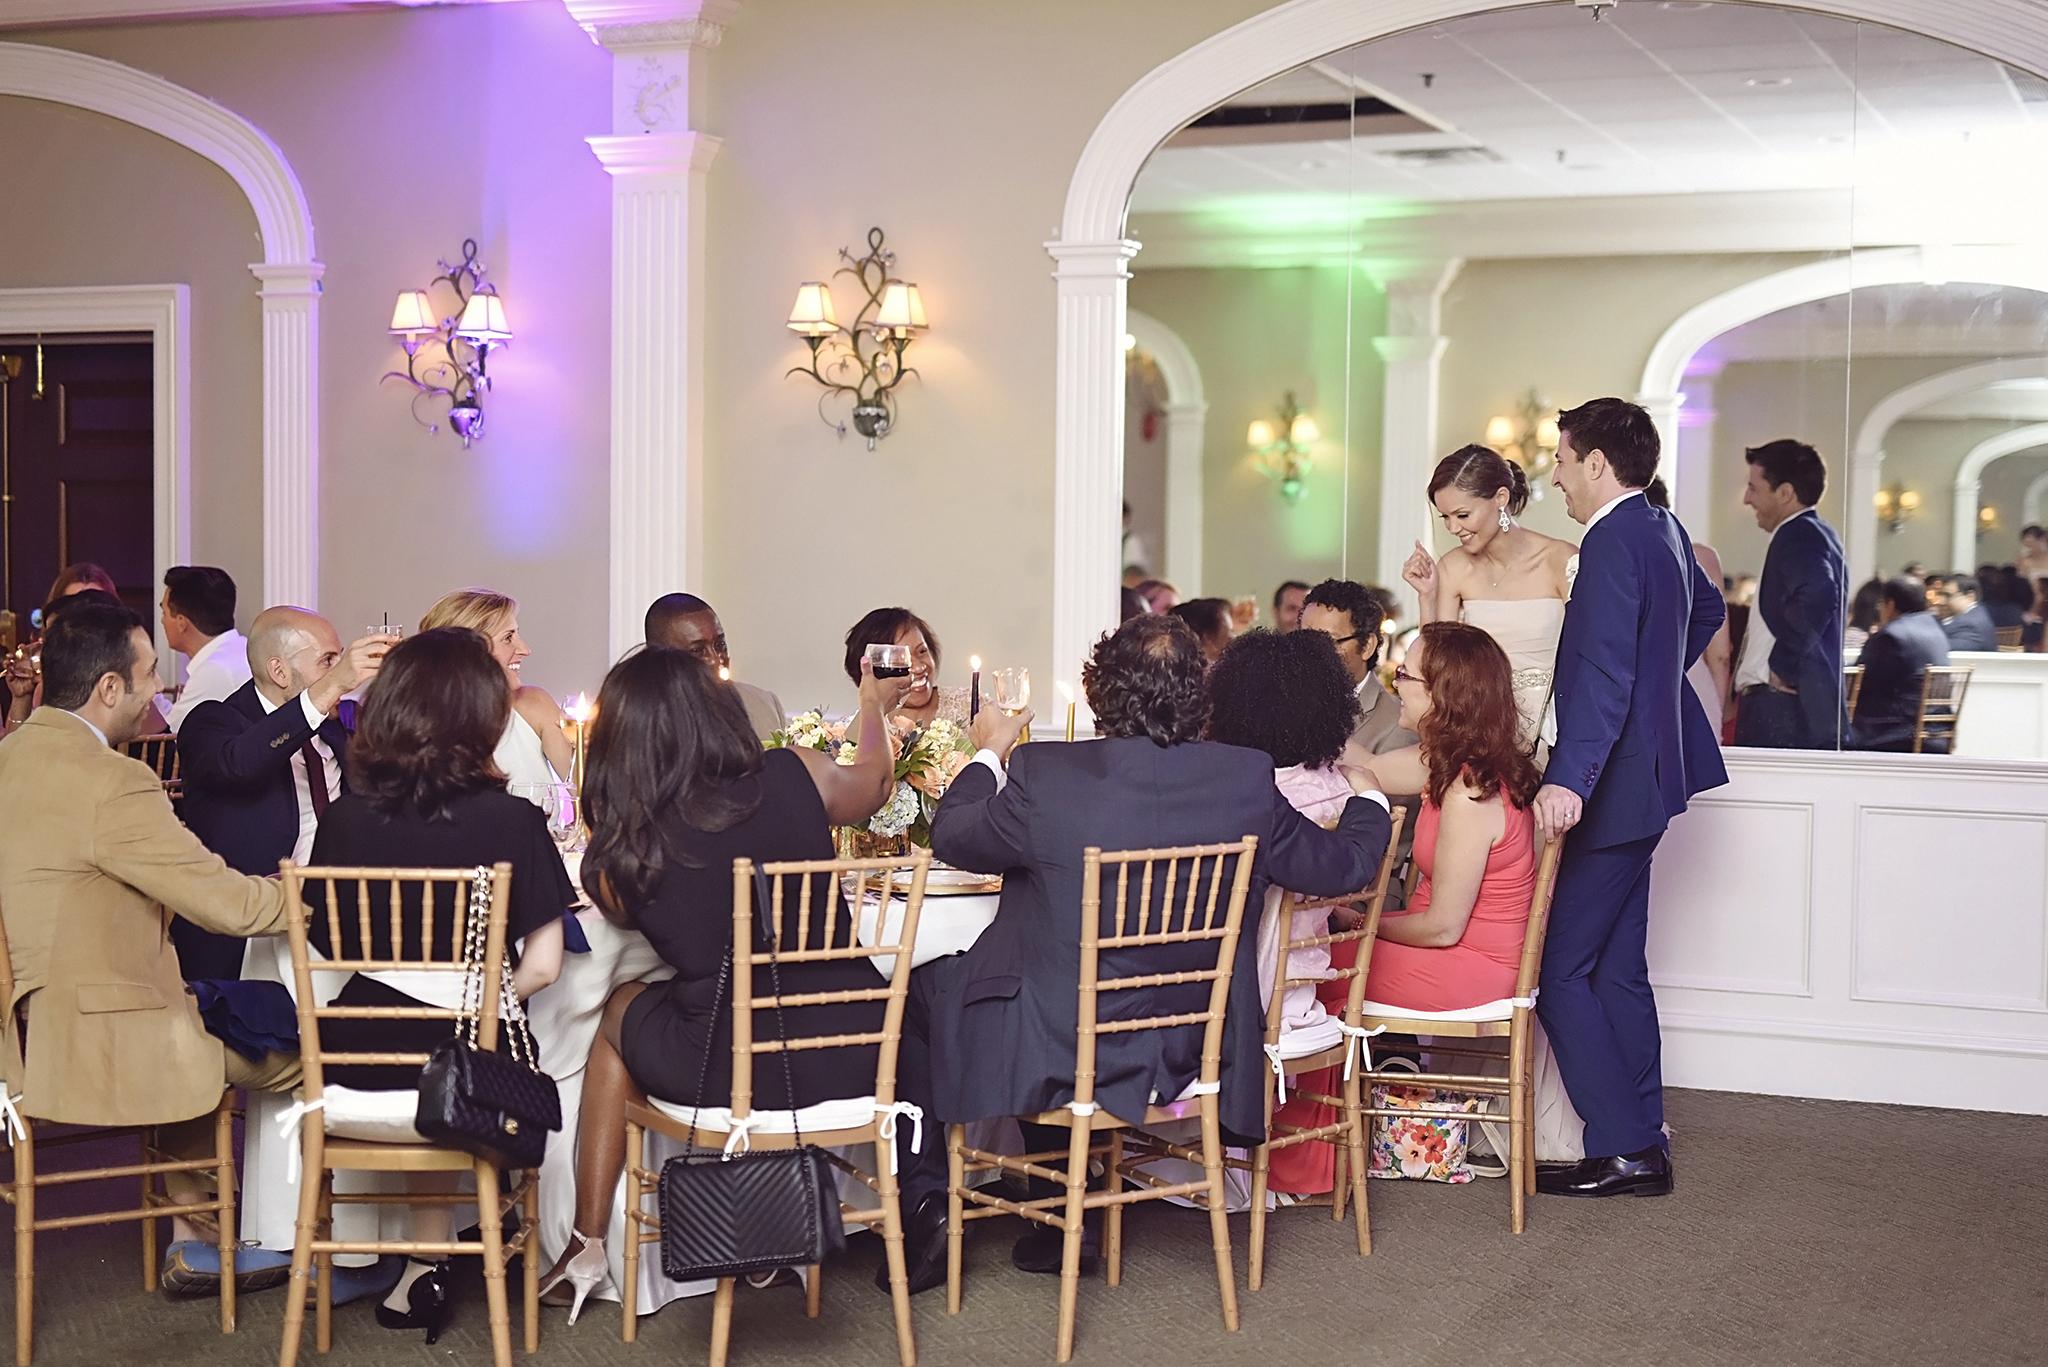 NJ-NY-wedding-photographer-154NJ-NY-wedding-photographer-154NJ-NY-WEDDING-PHOTOGRAPHER-154.JPG